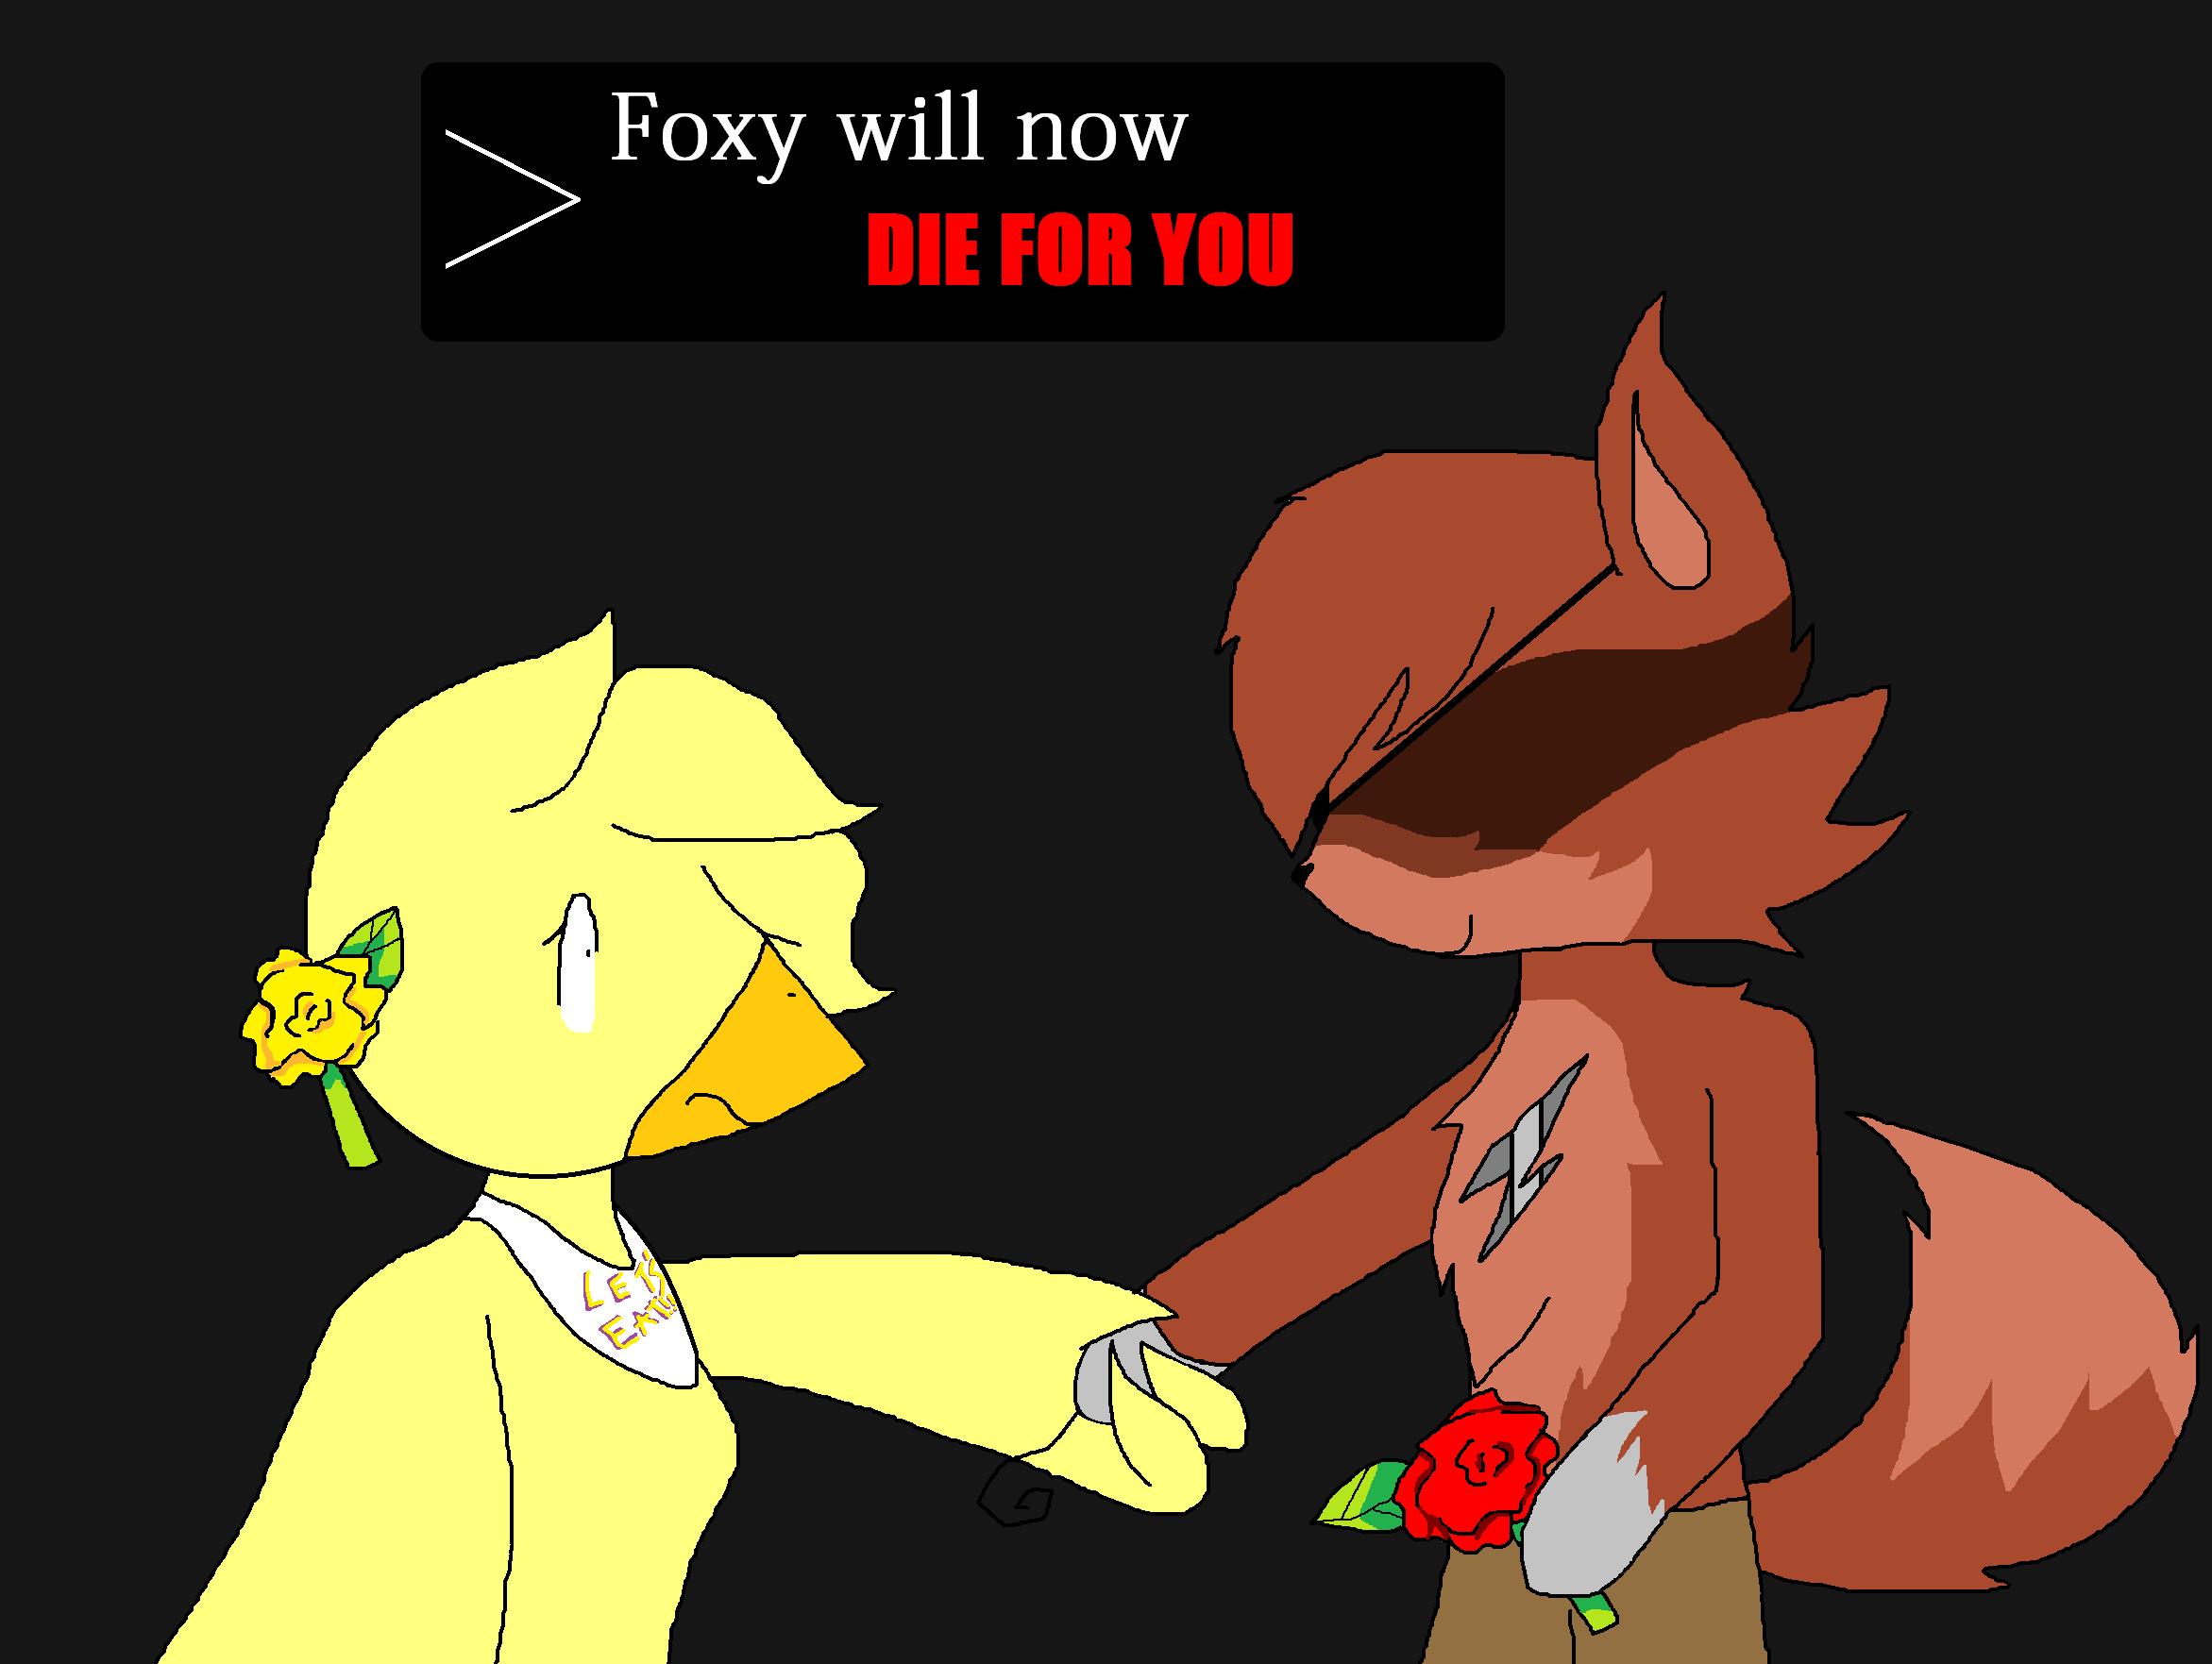 Fnaf fanfiction foxys in love sequel butik work